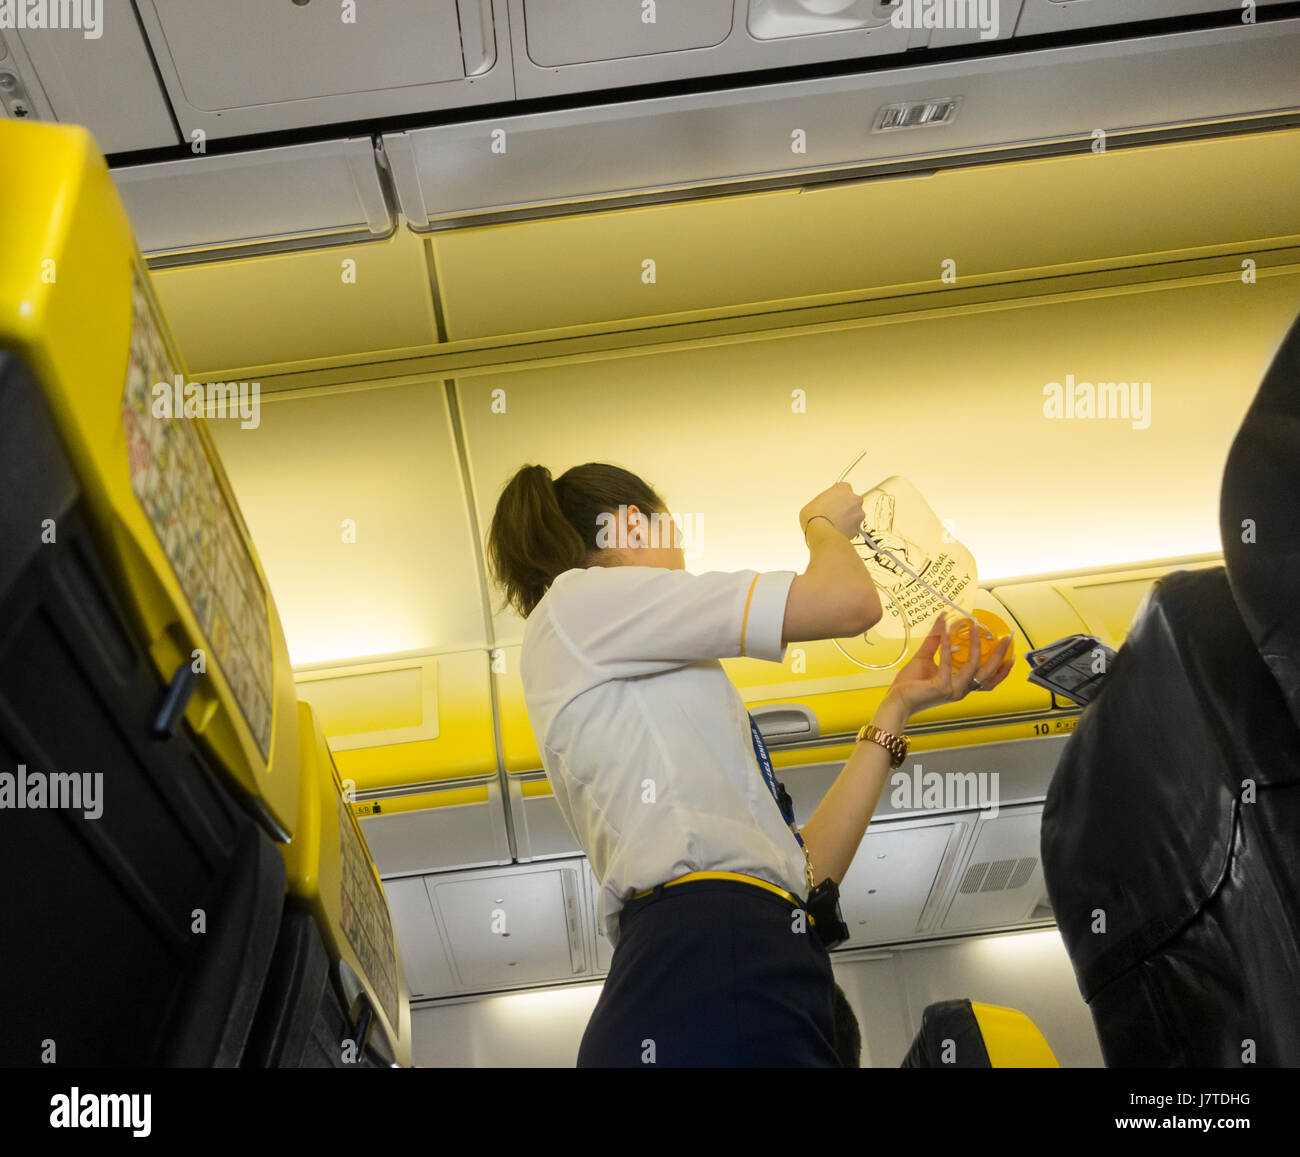 Ryanair pre flight safety demonstration - Stock Image